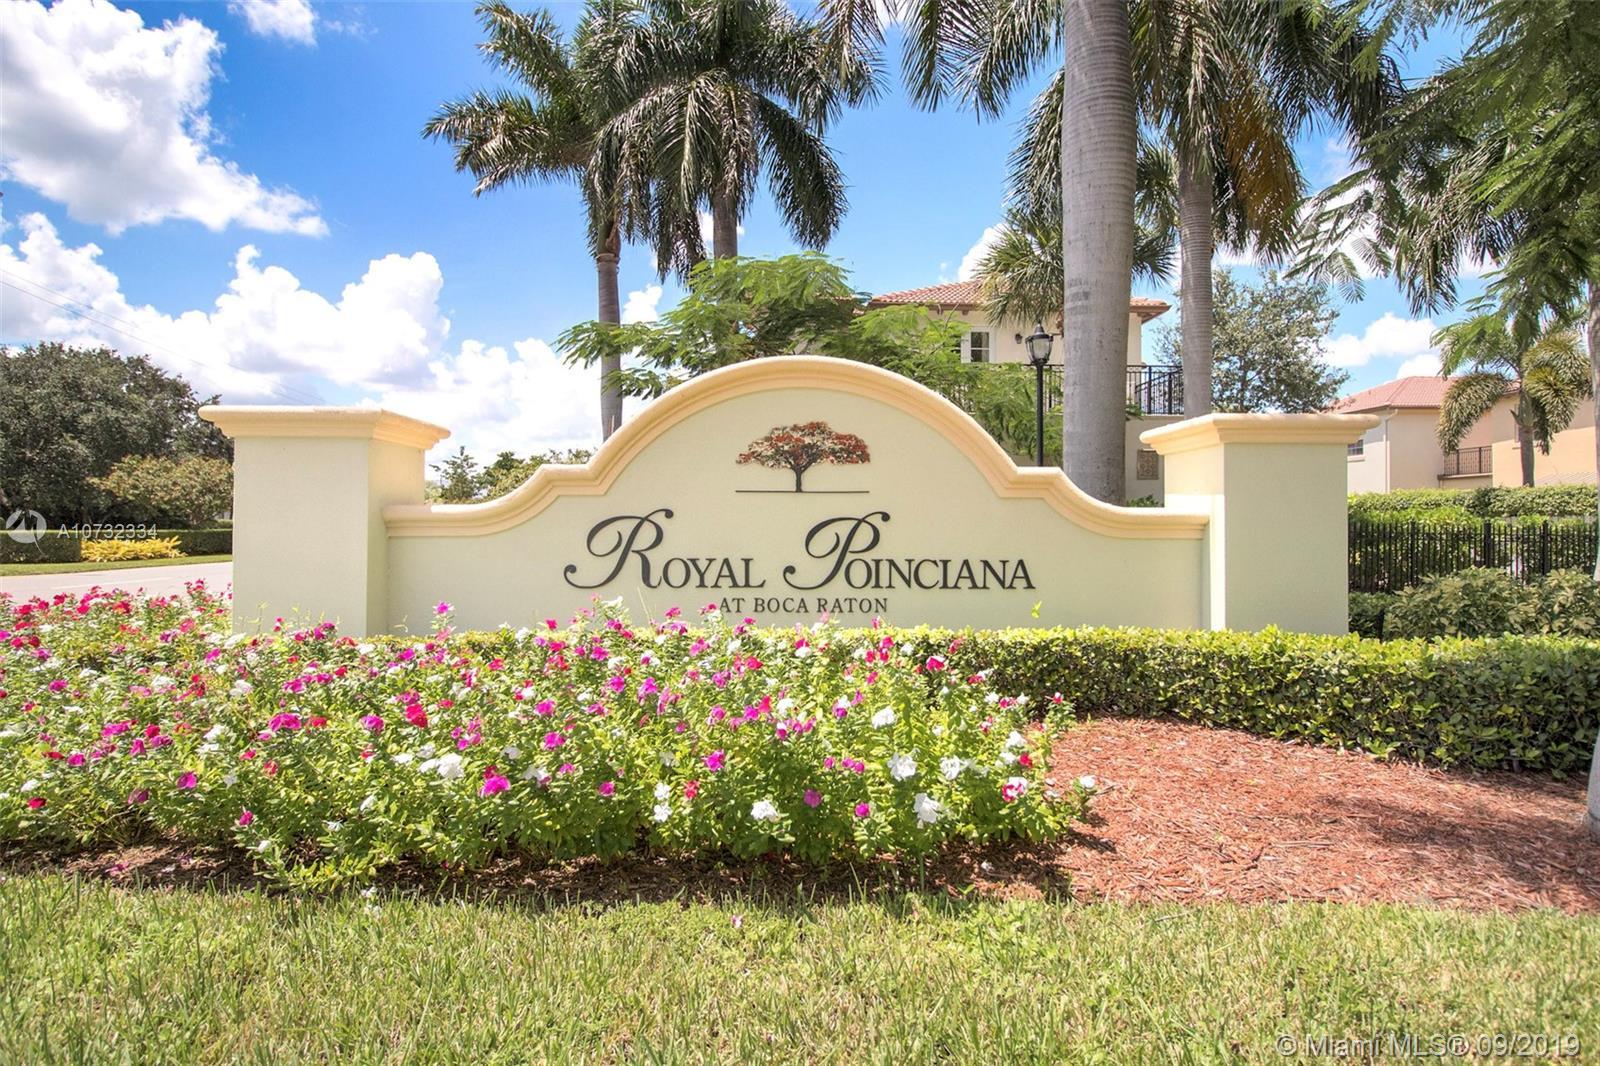 64 Via Poinciana Ln #64, Boca Raton, FL 33487 - Boca Raton, FL real estate listing